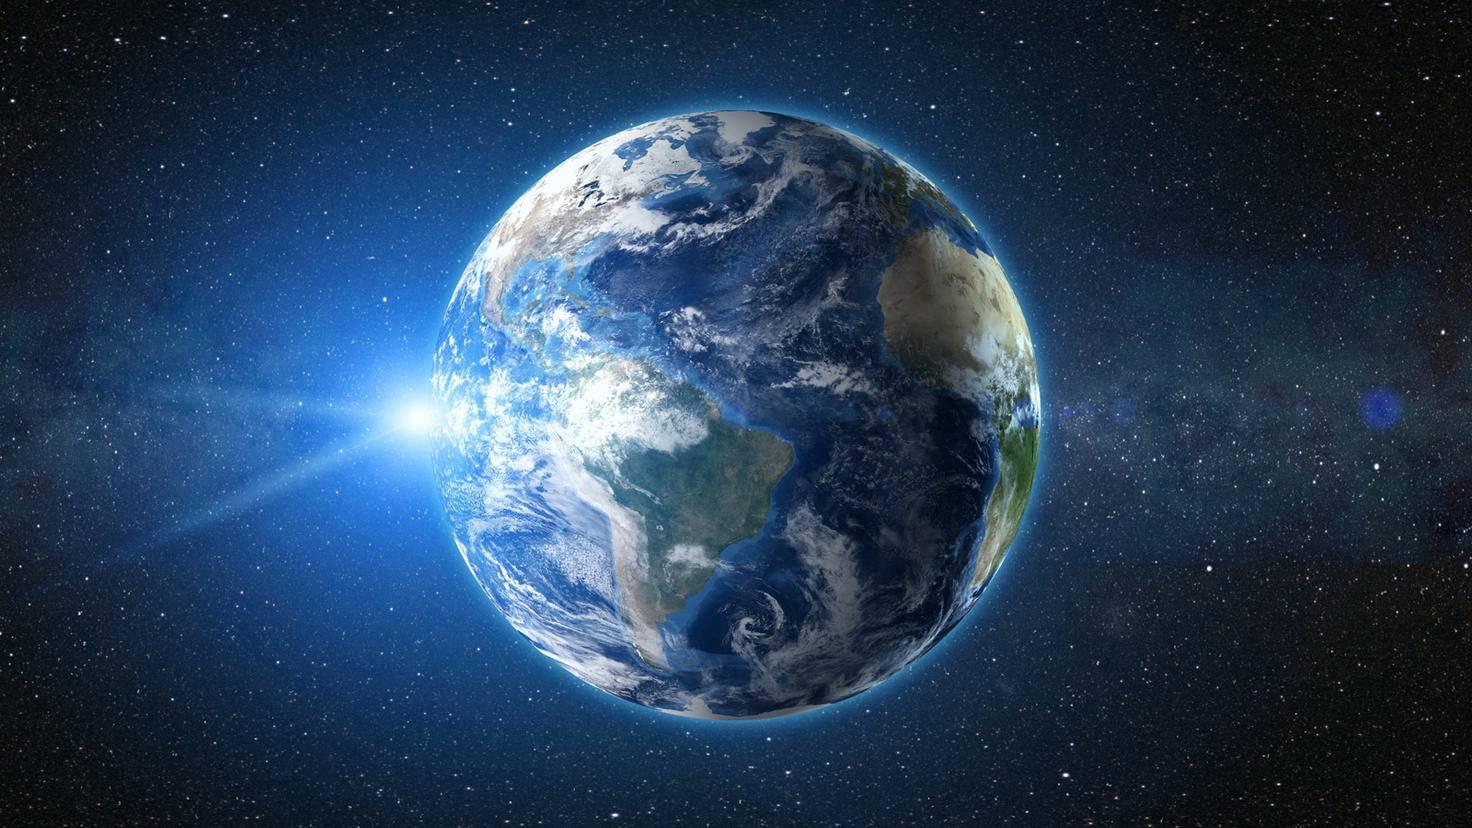 Erde-Planet-Weltraum-NASA-Goinyk-AdobeStock